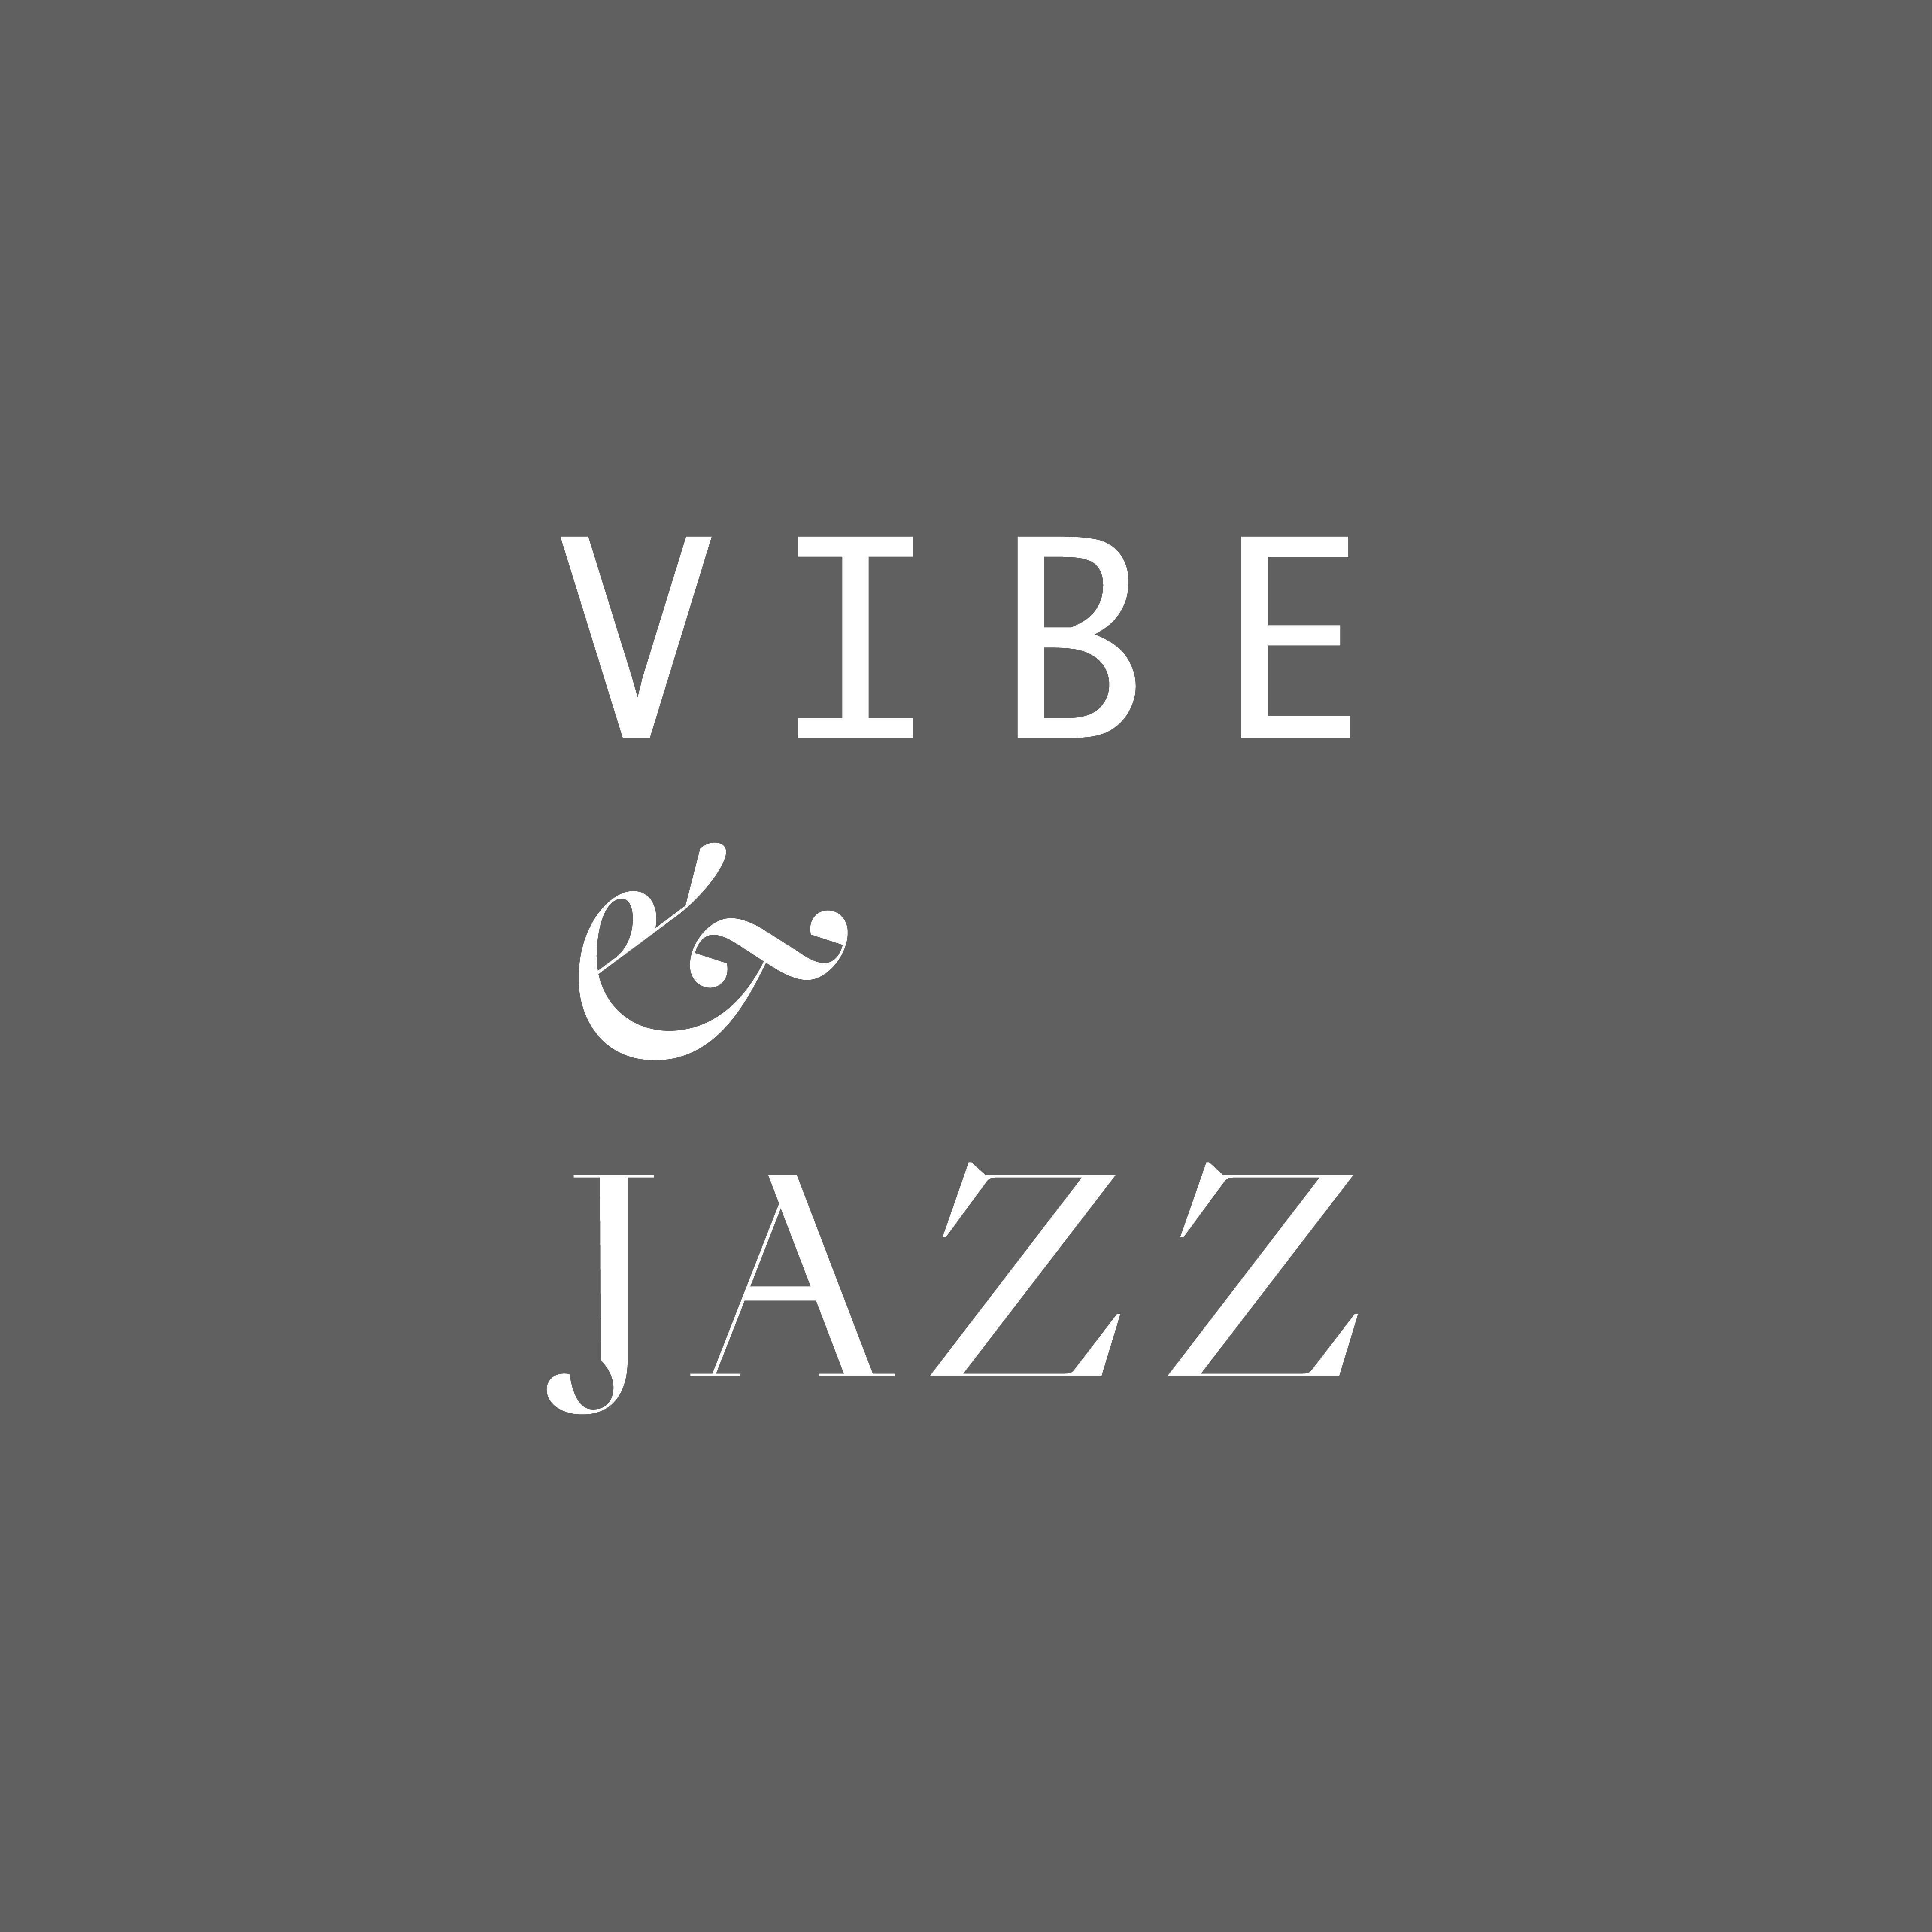 Vibe&Jazz:Inspirațional